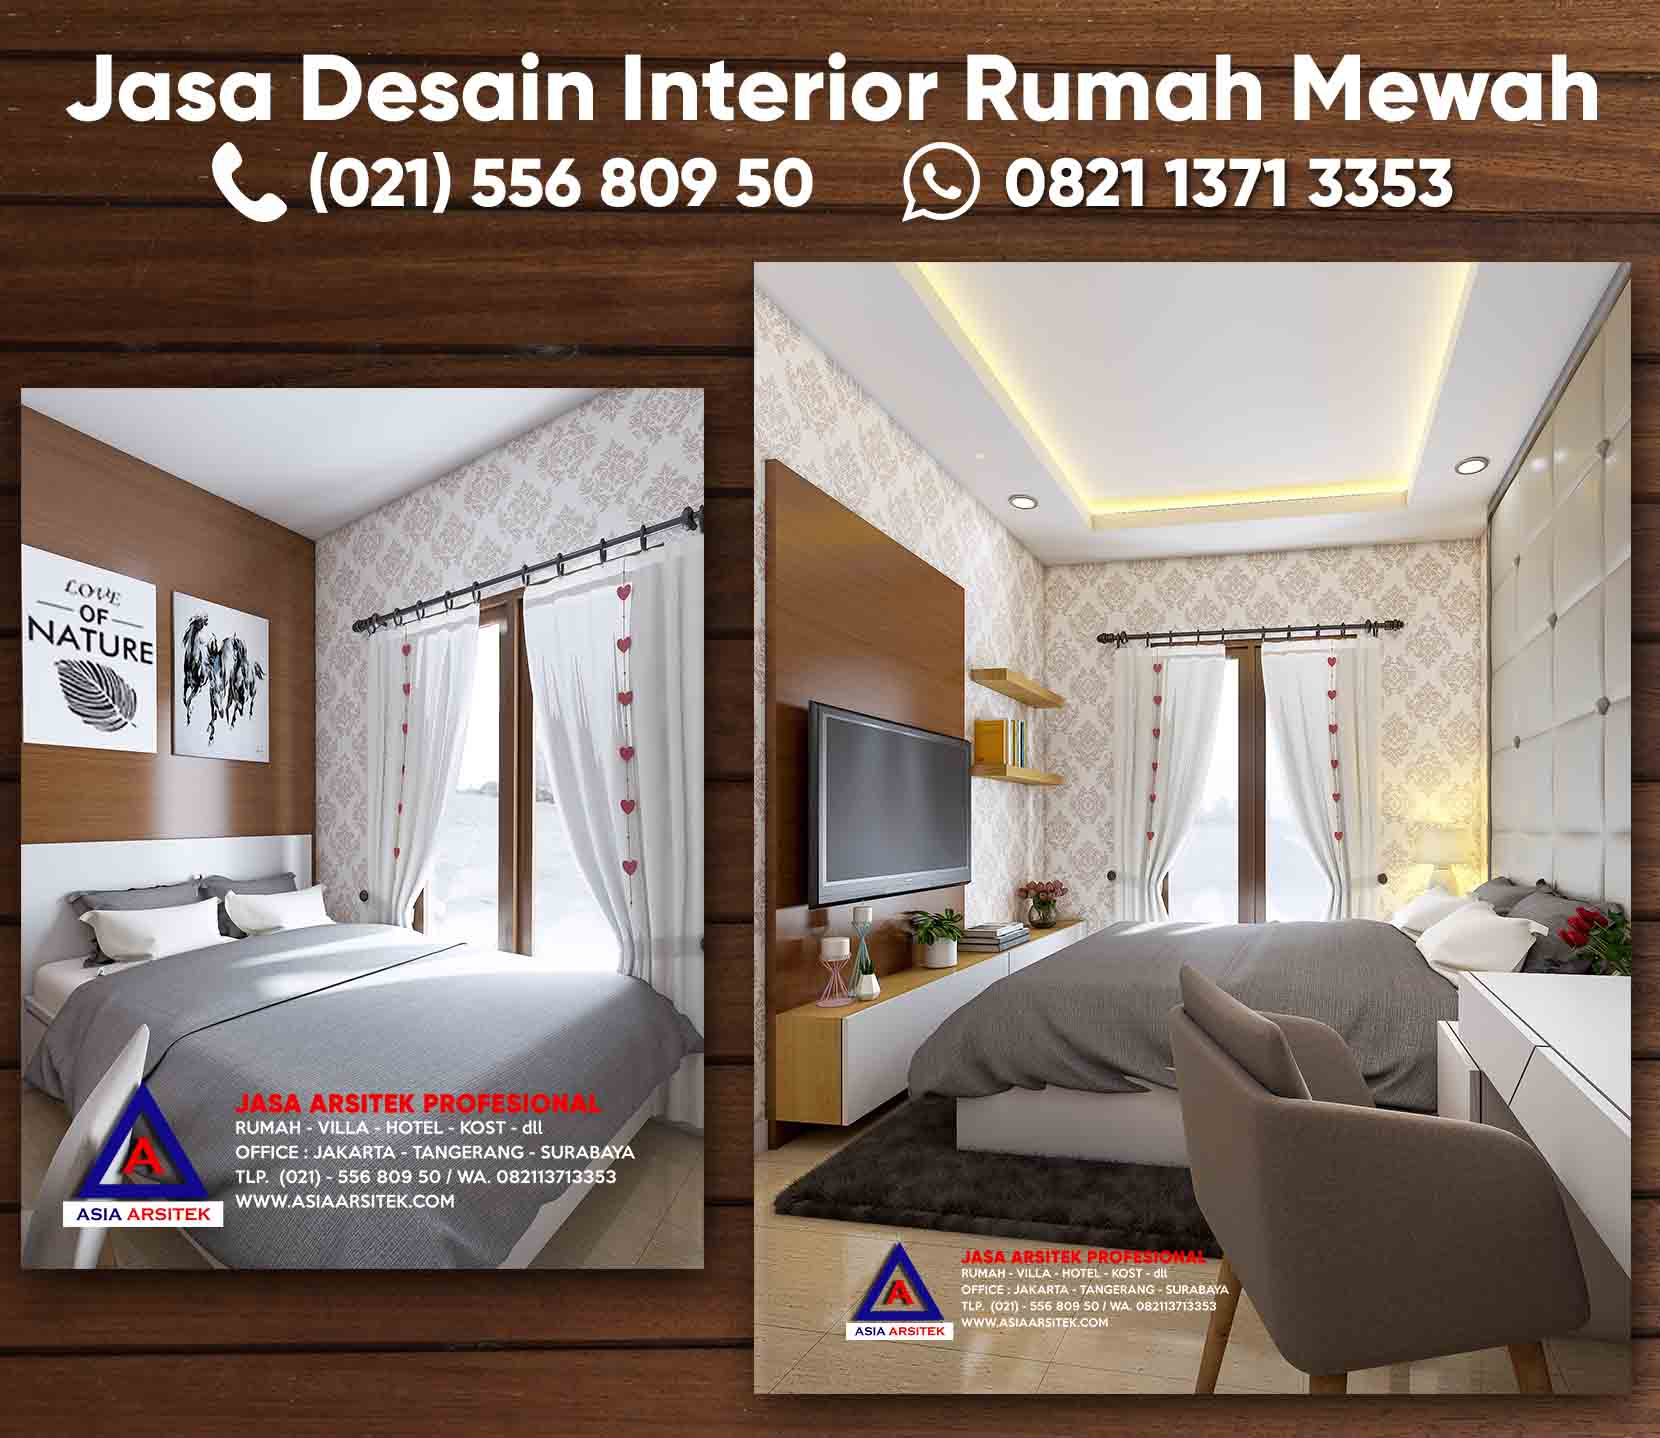 Jasa Desain Interior Rumah Kamar Tidur Minimalis Modern Asia Arsitek